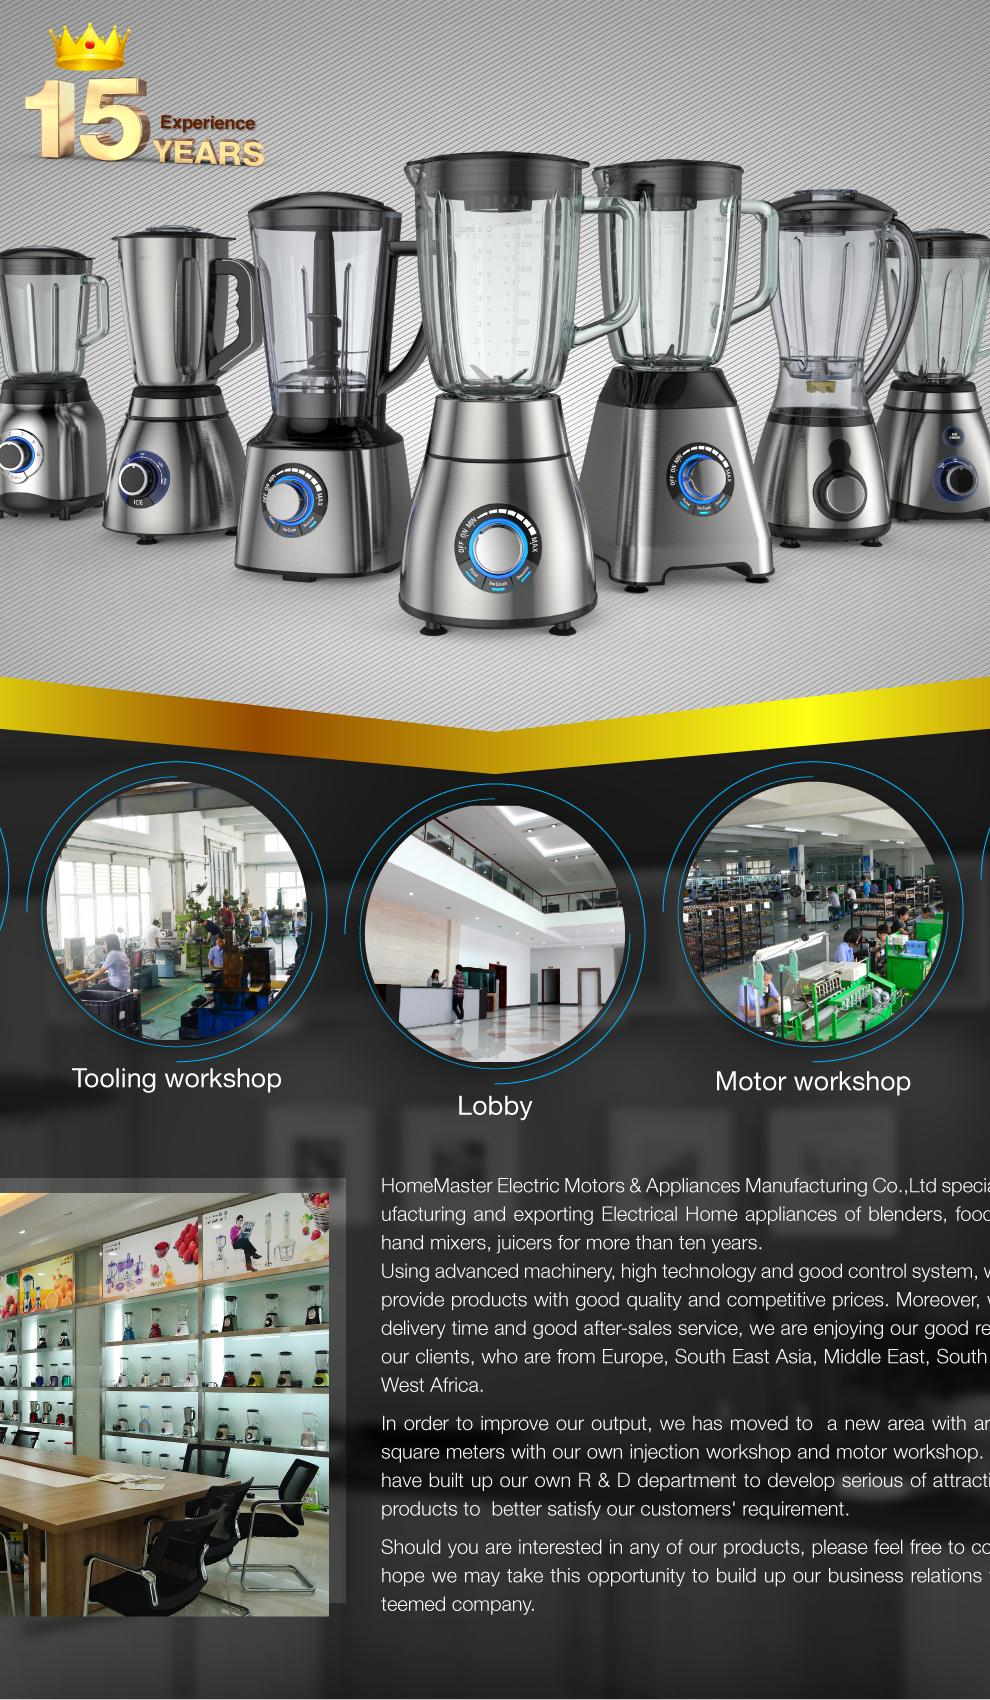 HomeMaster Electric Motors & Appliances Manufacturing Co., Ltd ...